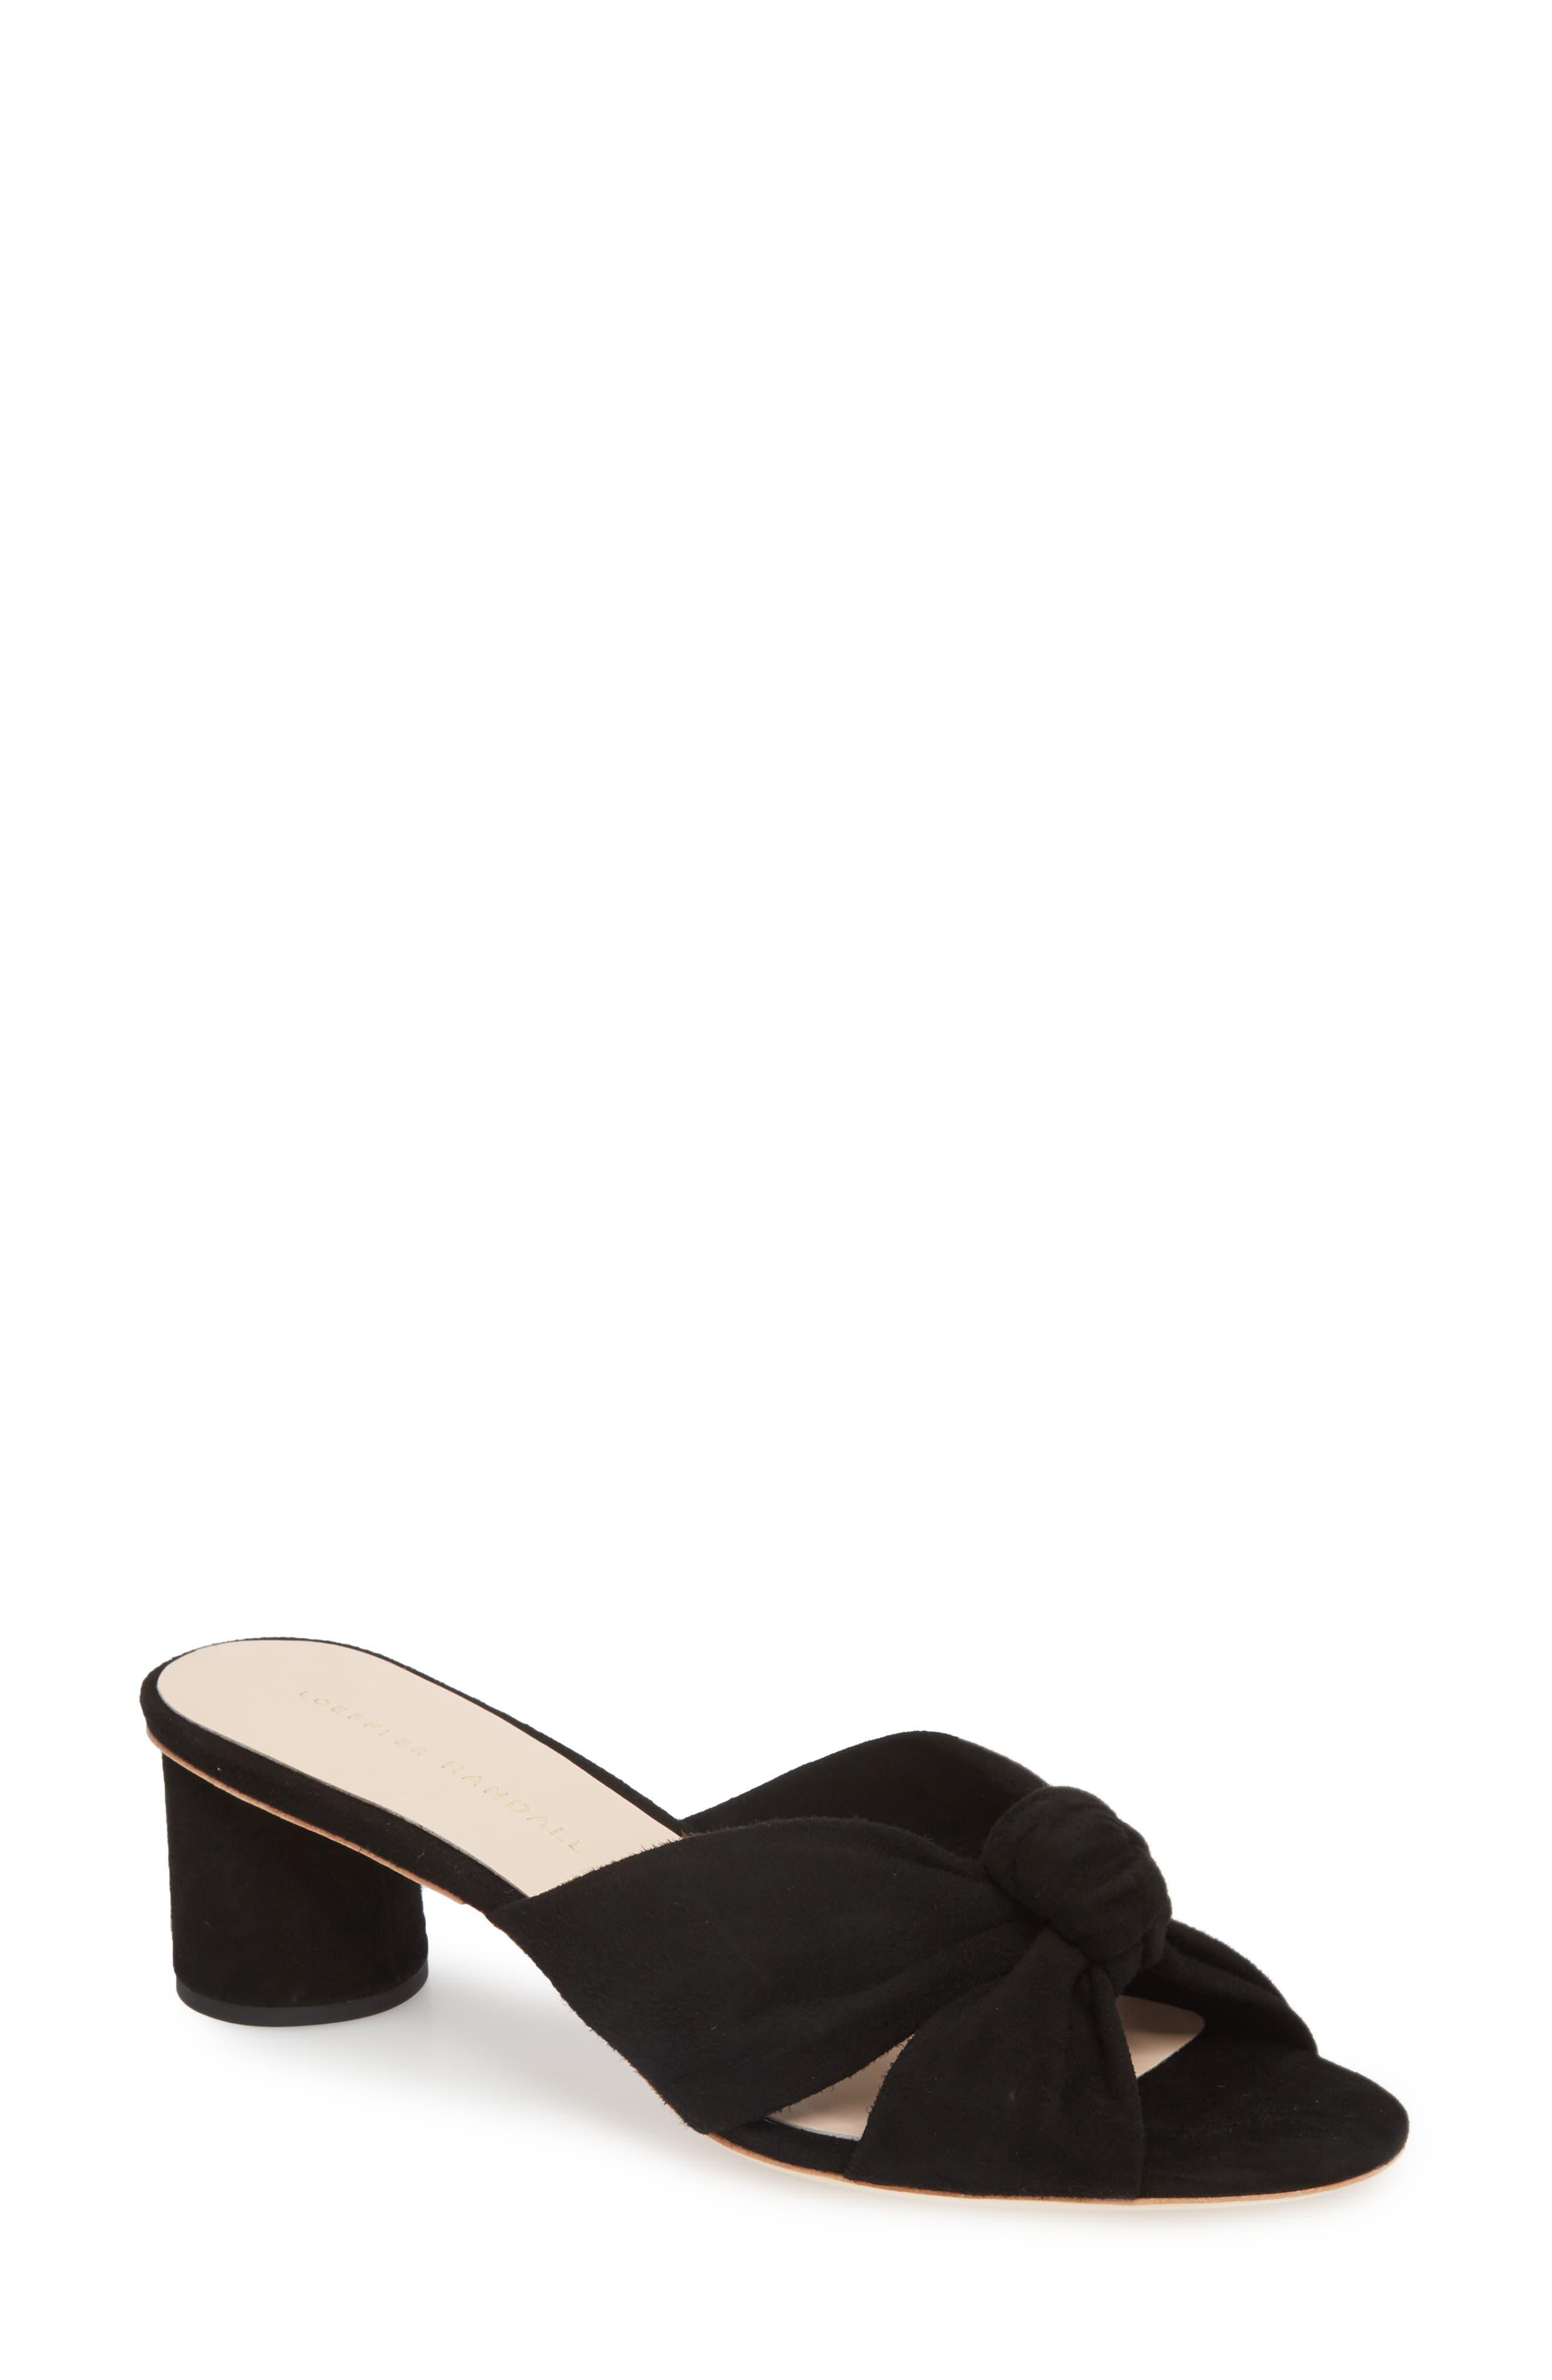 Loeffler Randal Celeste Knotted Slide Sandal,                         Main,                         color, BLACK